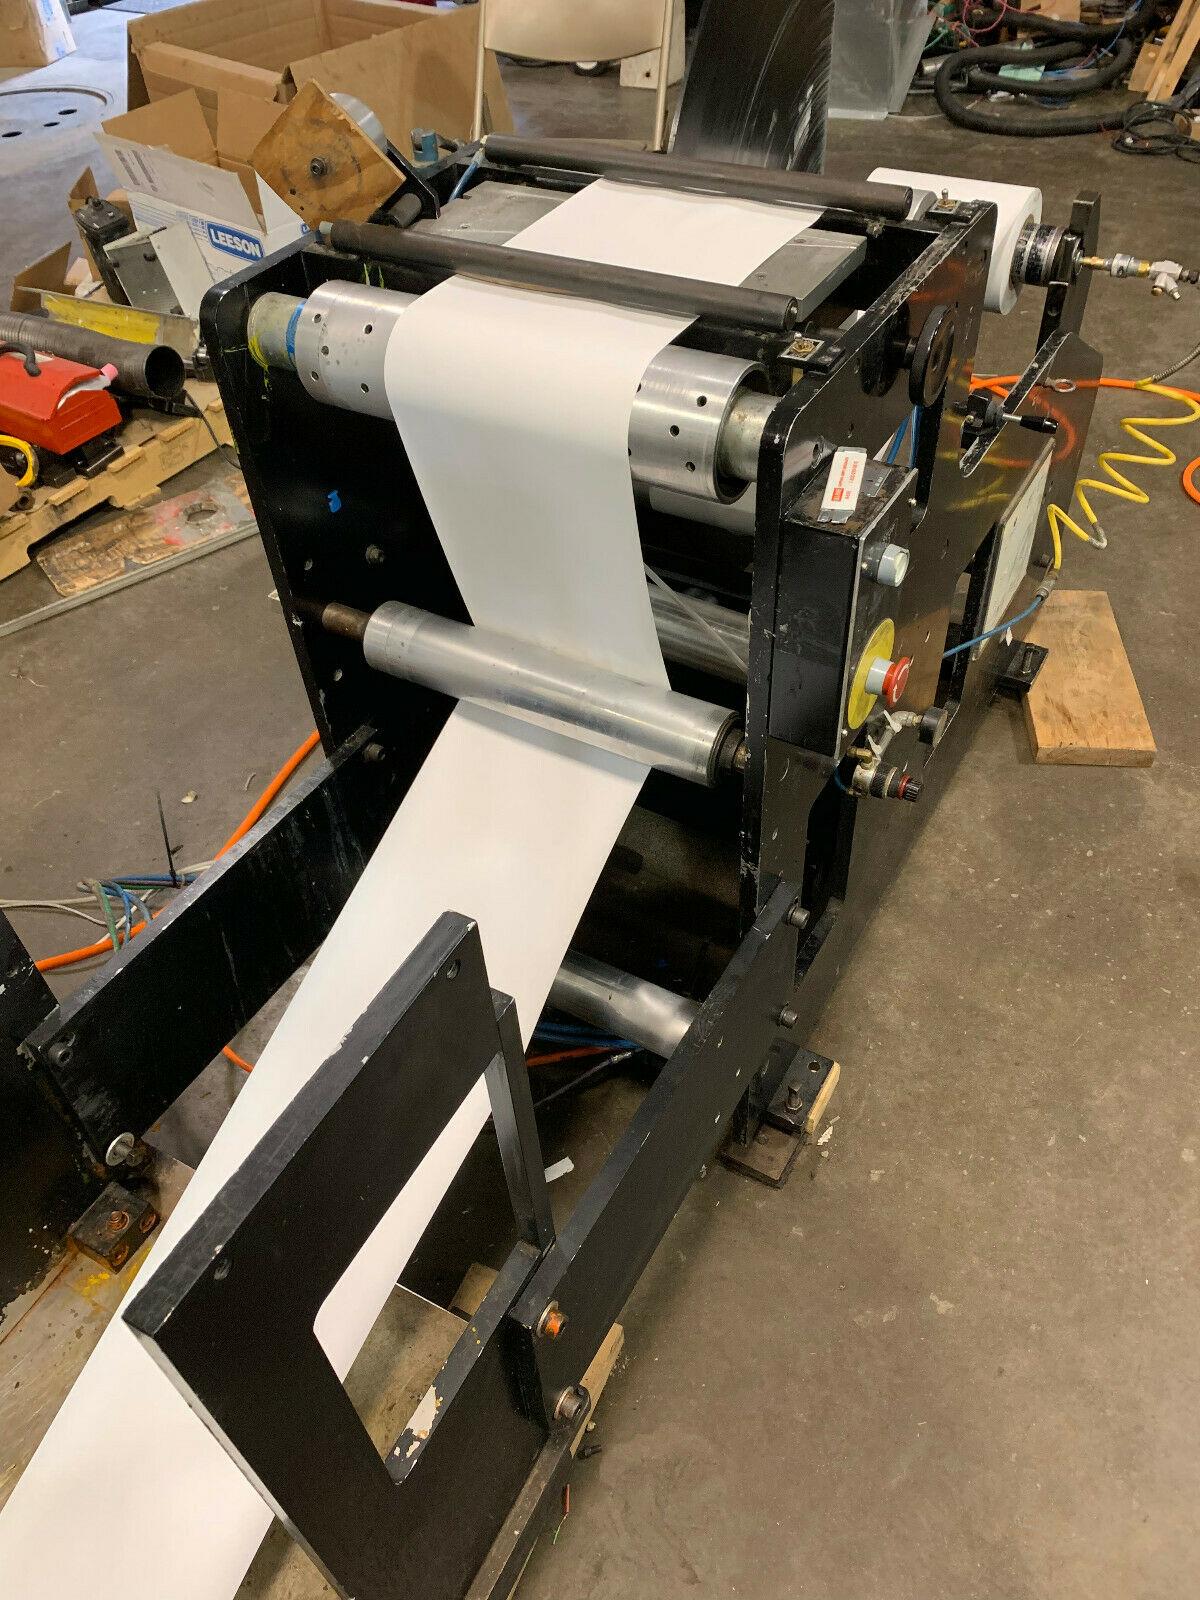 Rotoflex DLI330 - Used Flexo Printing Presses and Used Flexographic Equipment-11